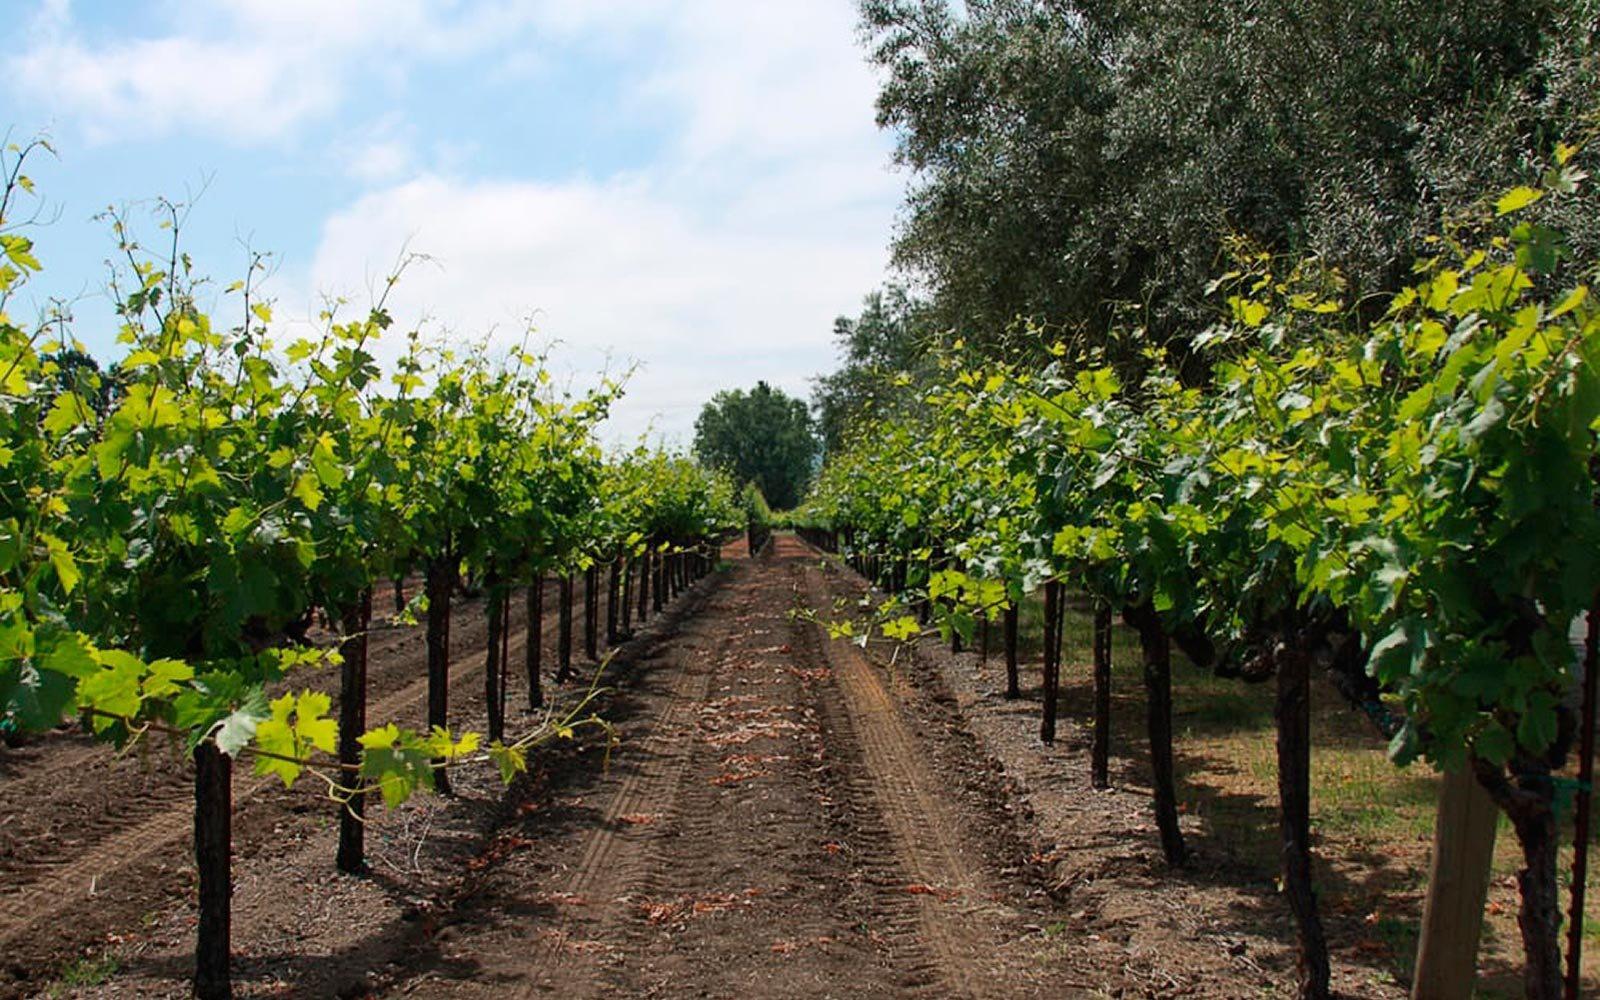 01-vincent-arroyo-winery-california-YELPWINERIES0617.jpg